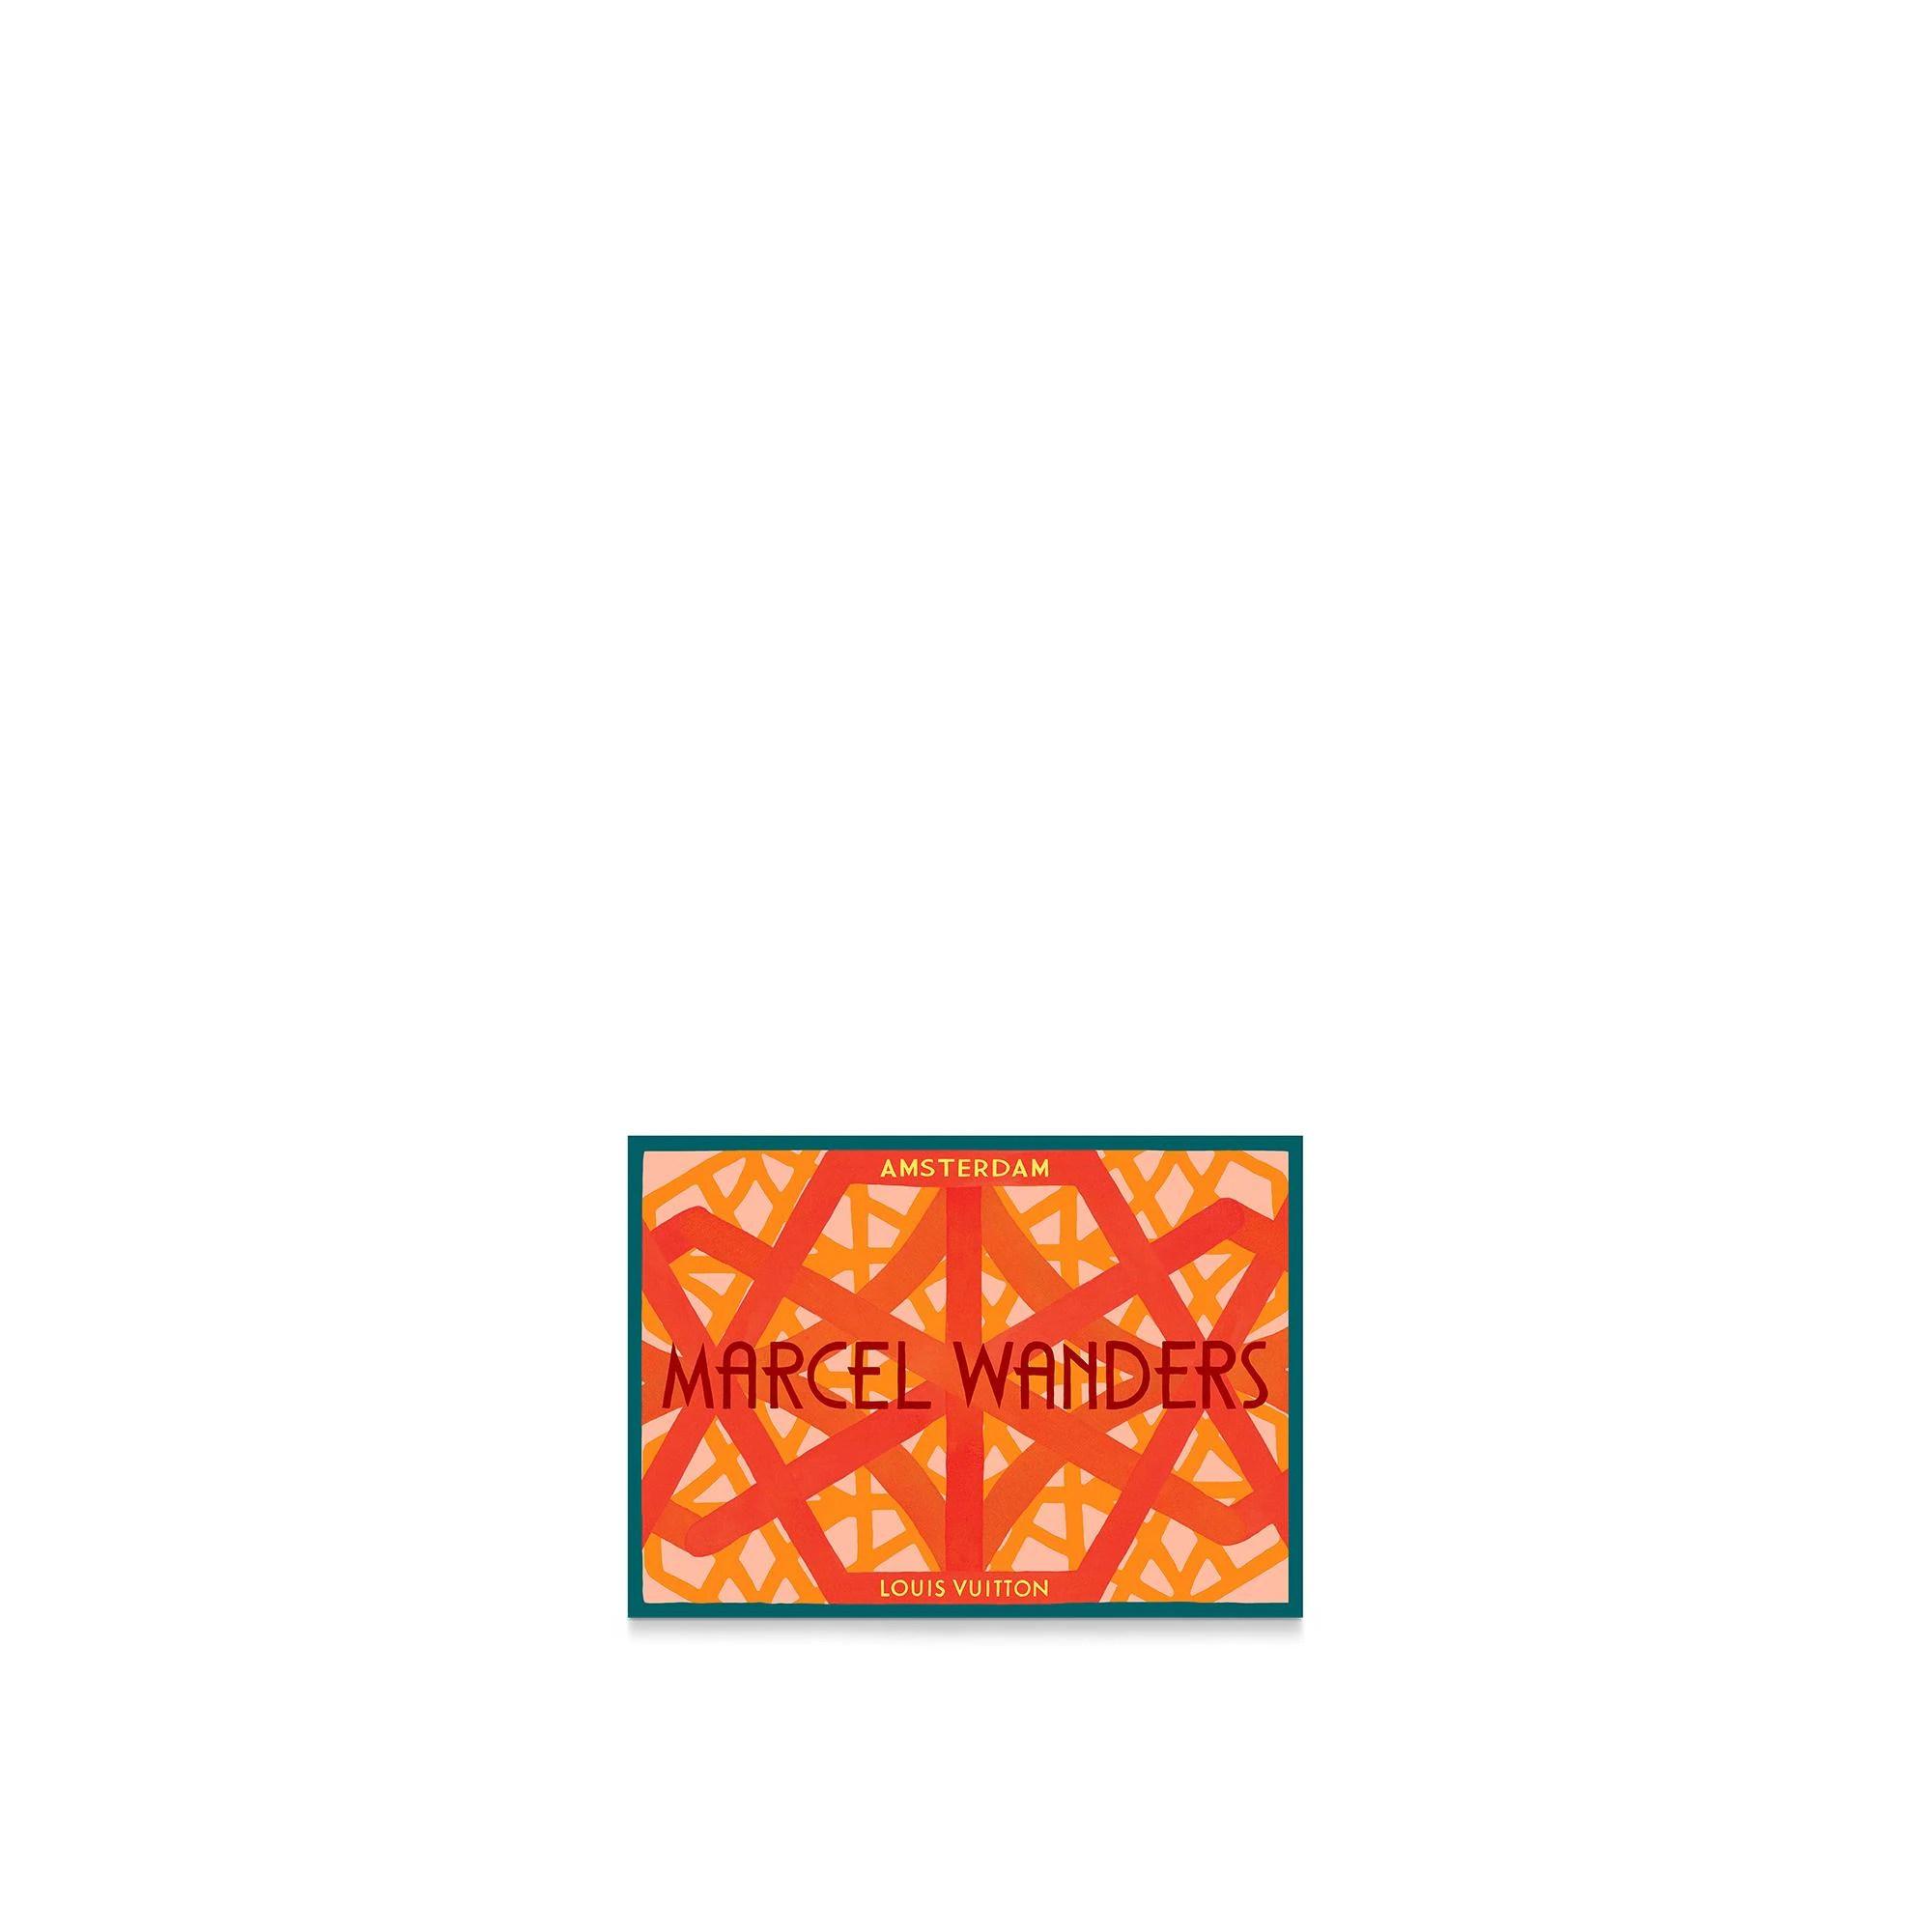 poster von marcel wanders sans ligne